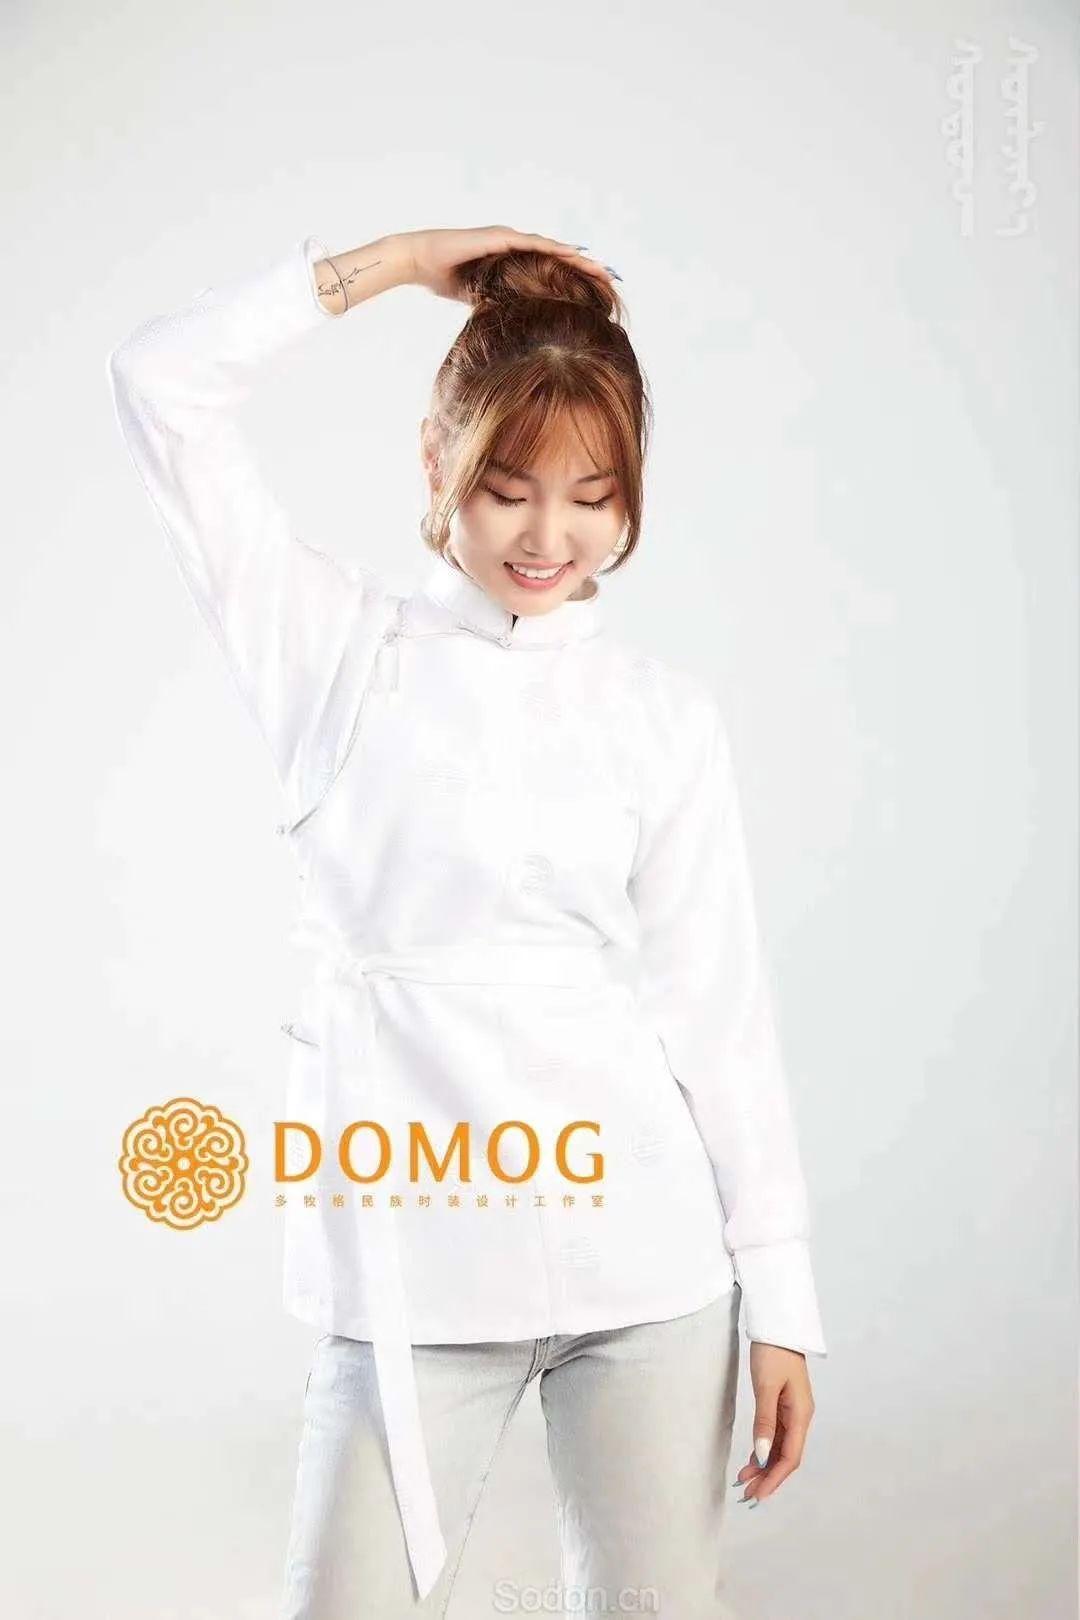 DOMOG 蒙古时装2020新款,民族与时尚的融合 第31张 DOMOG 蒙古时装2020新款,民族与时尚的融合 蒙古服饰